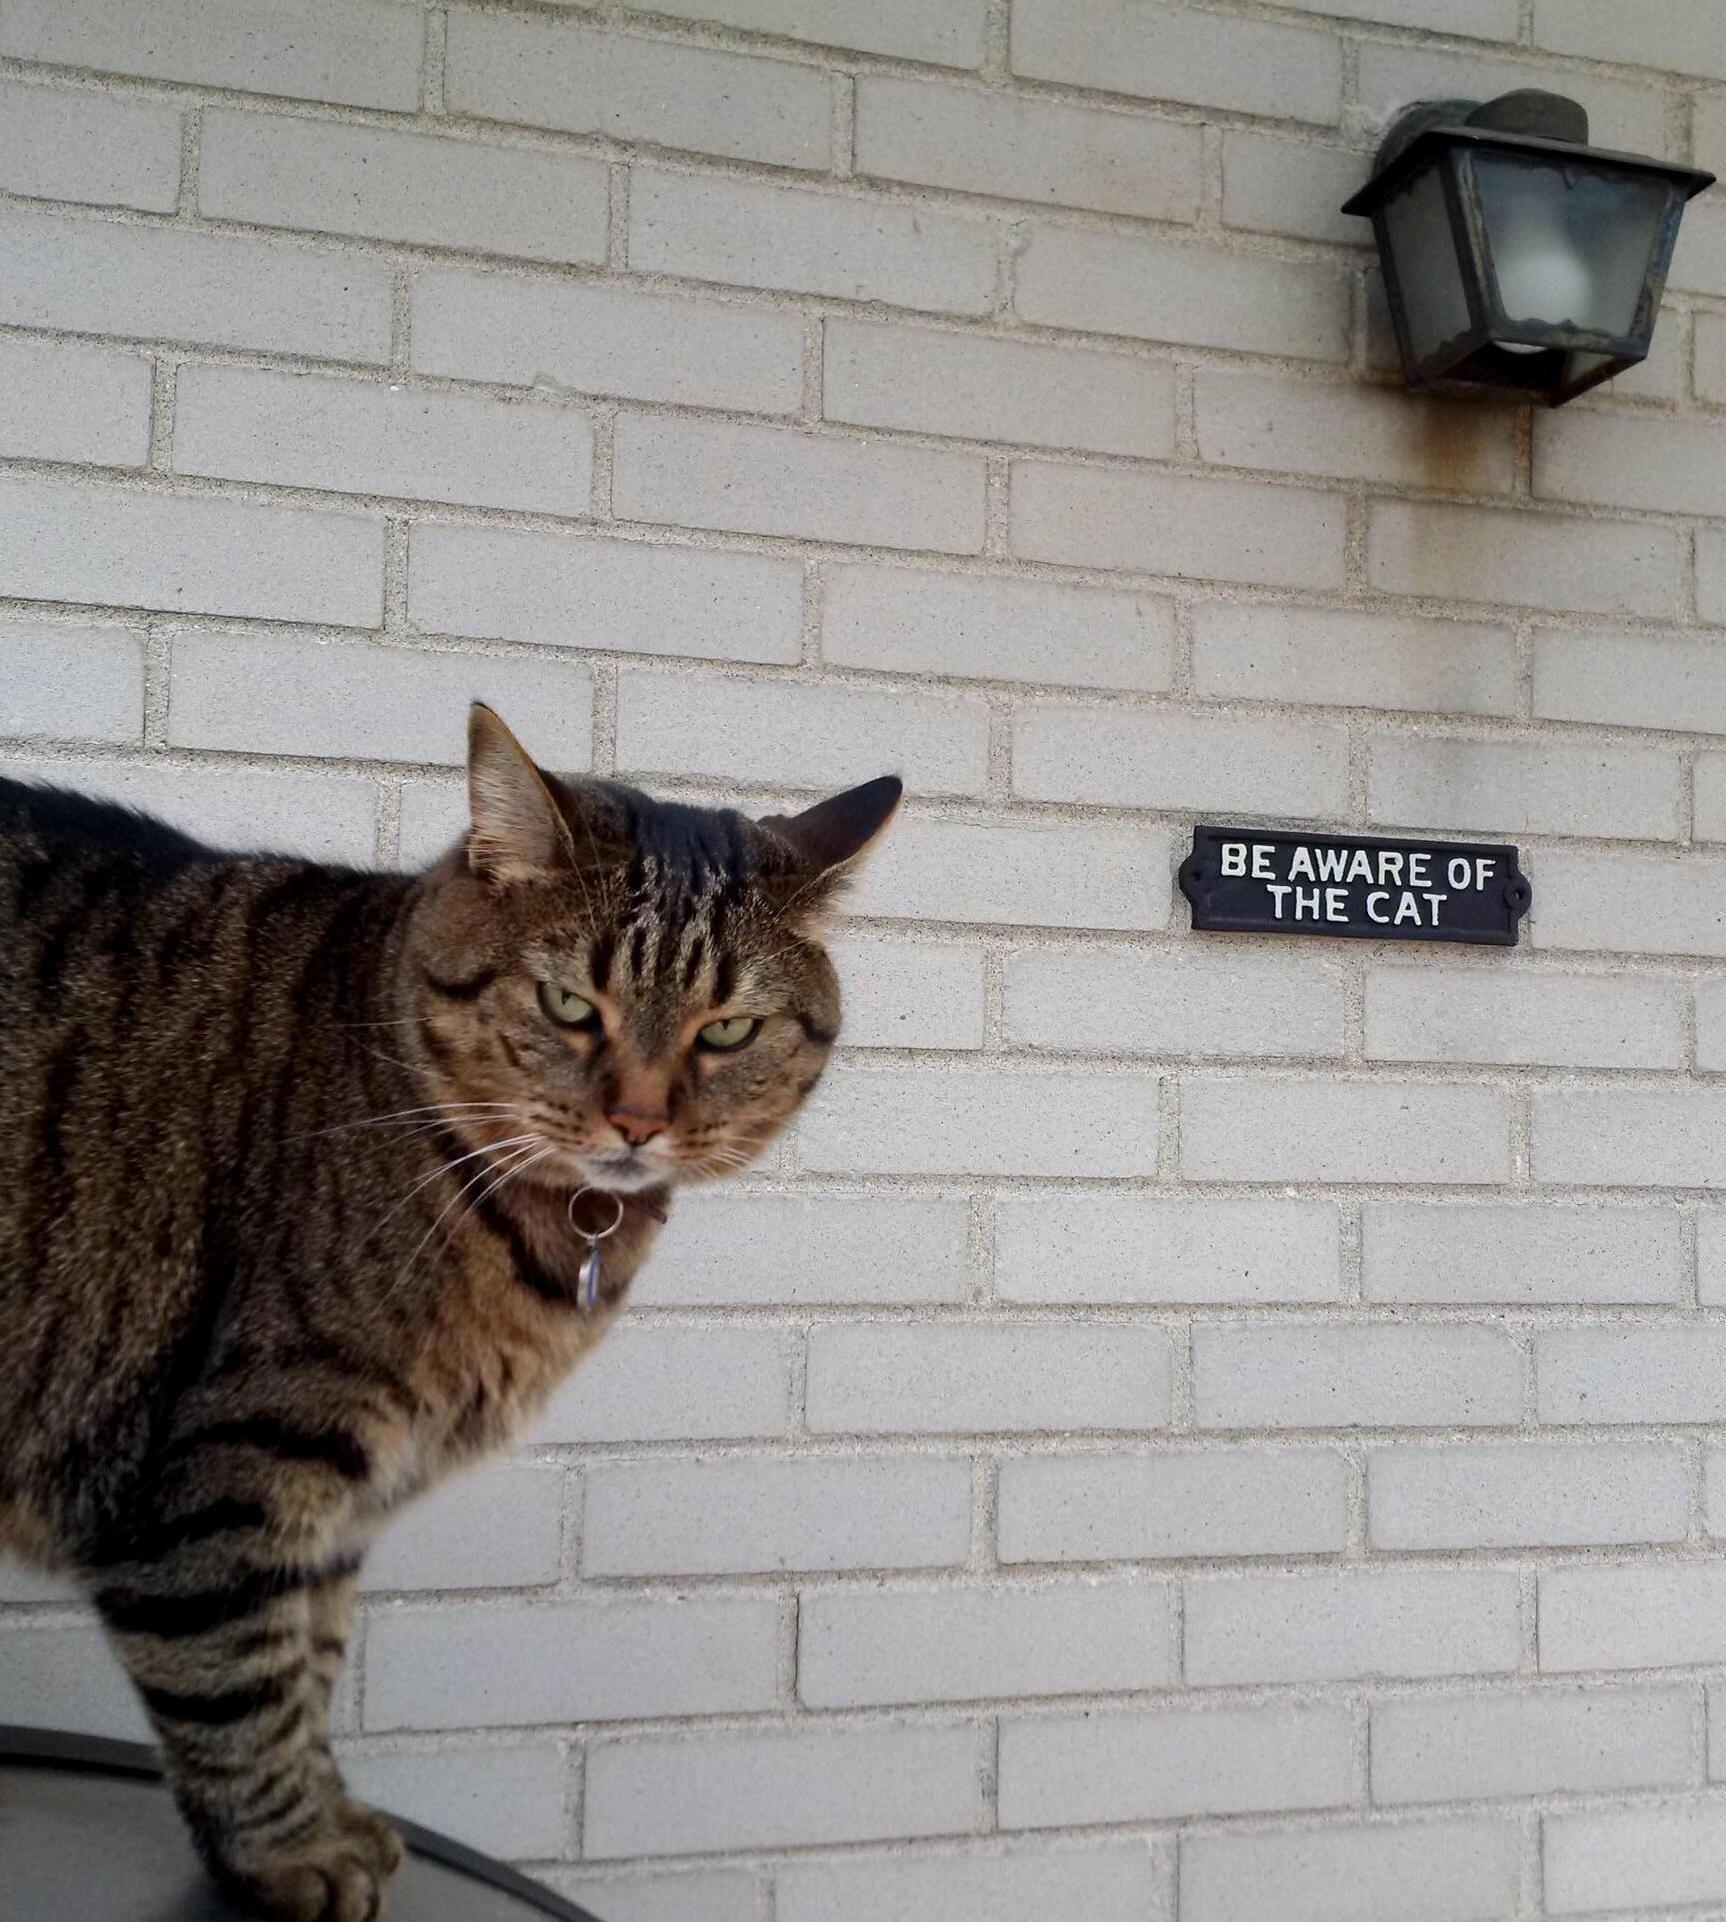 Take caution cat.